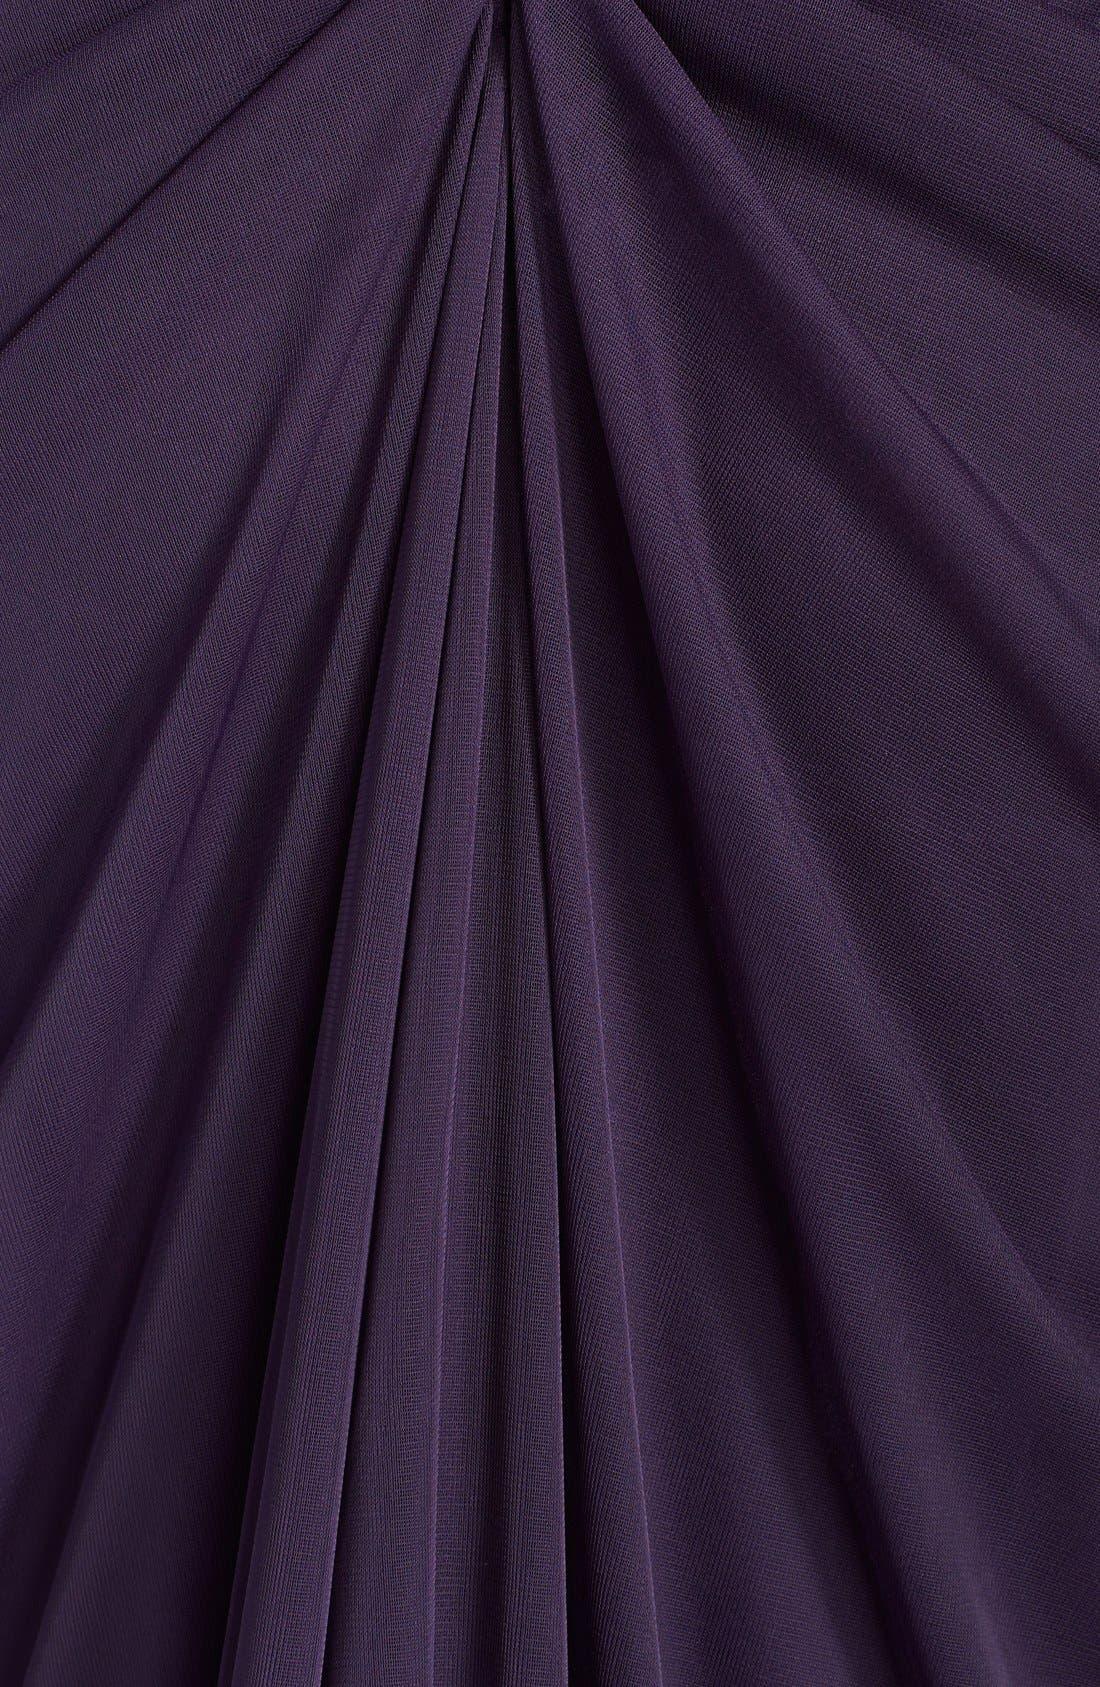 Lace Yoke Drape Gown,                             Alternate thumbnail 19, color,